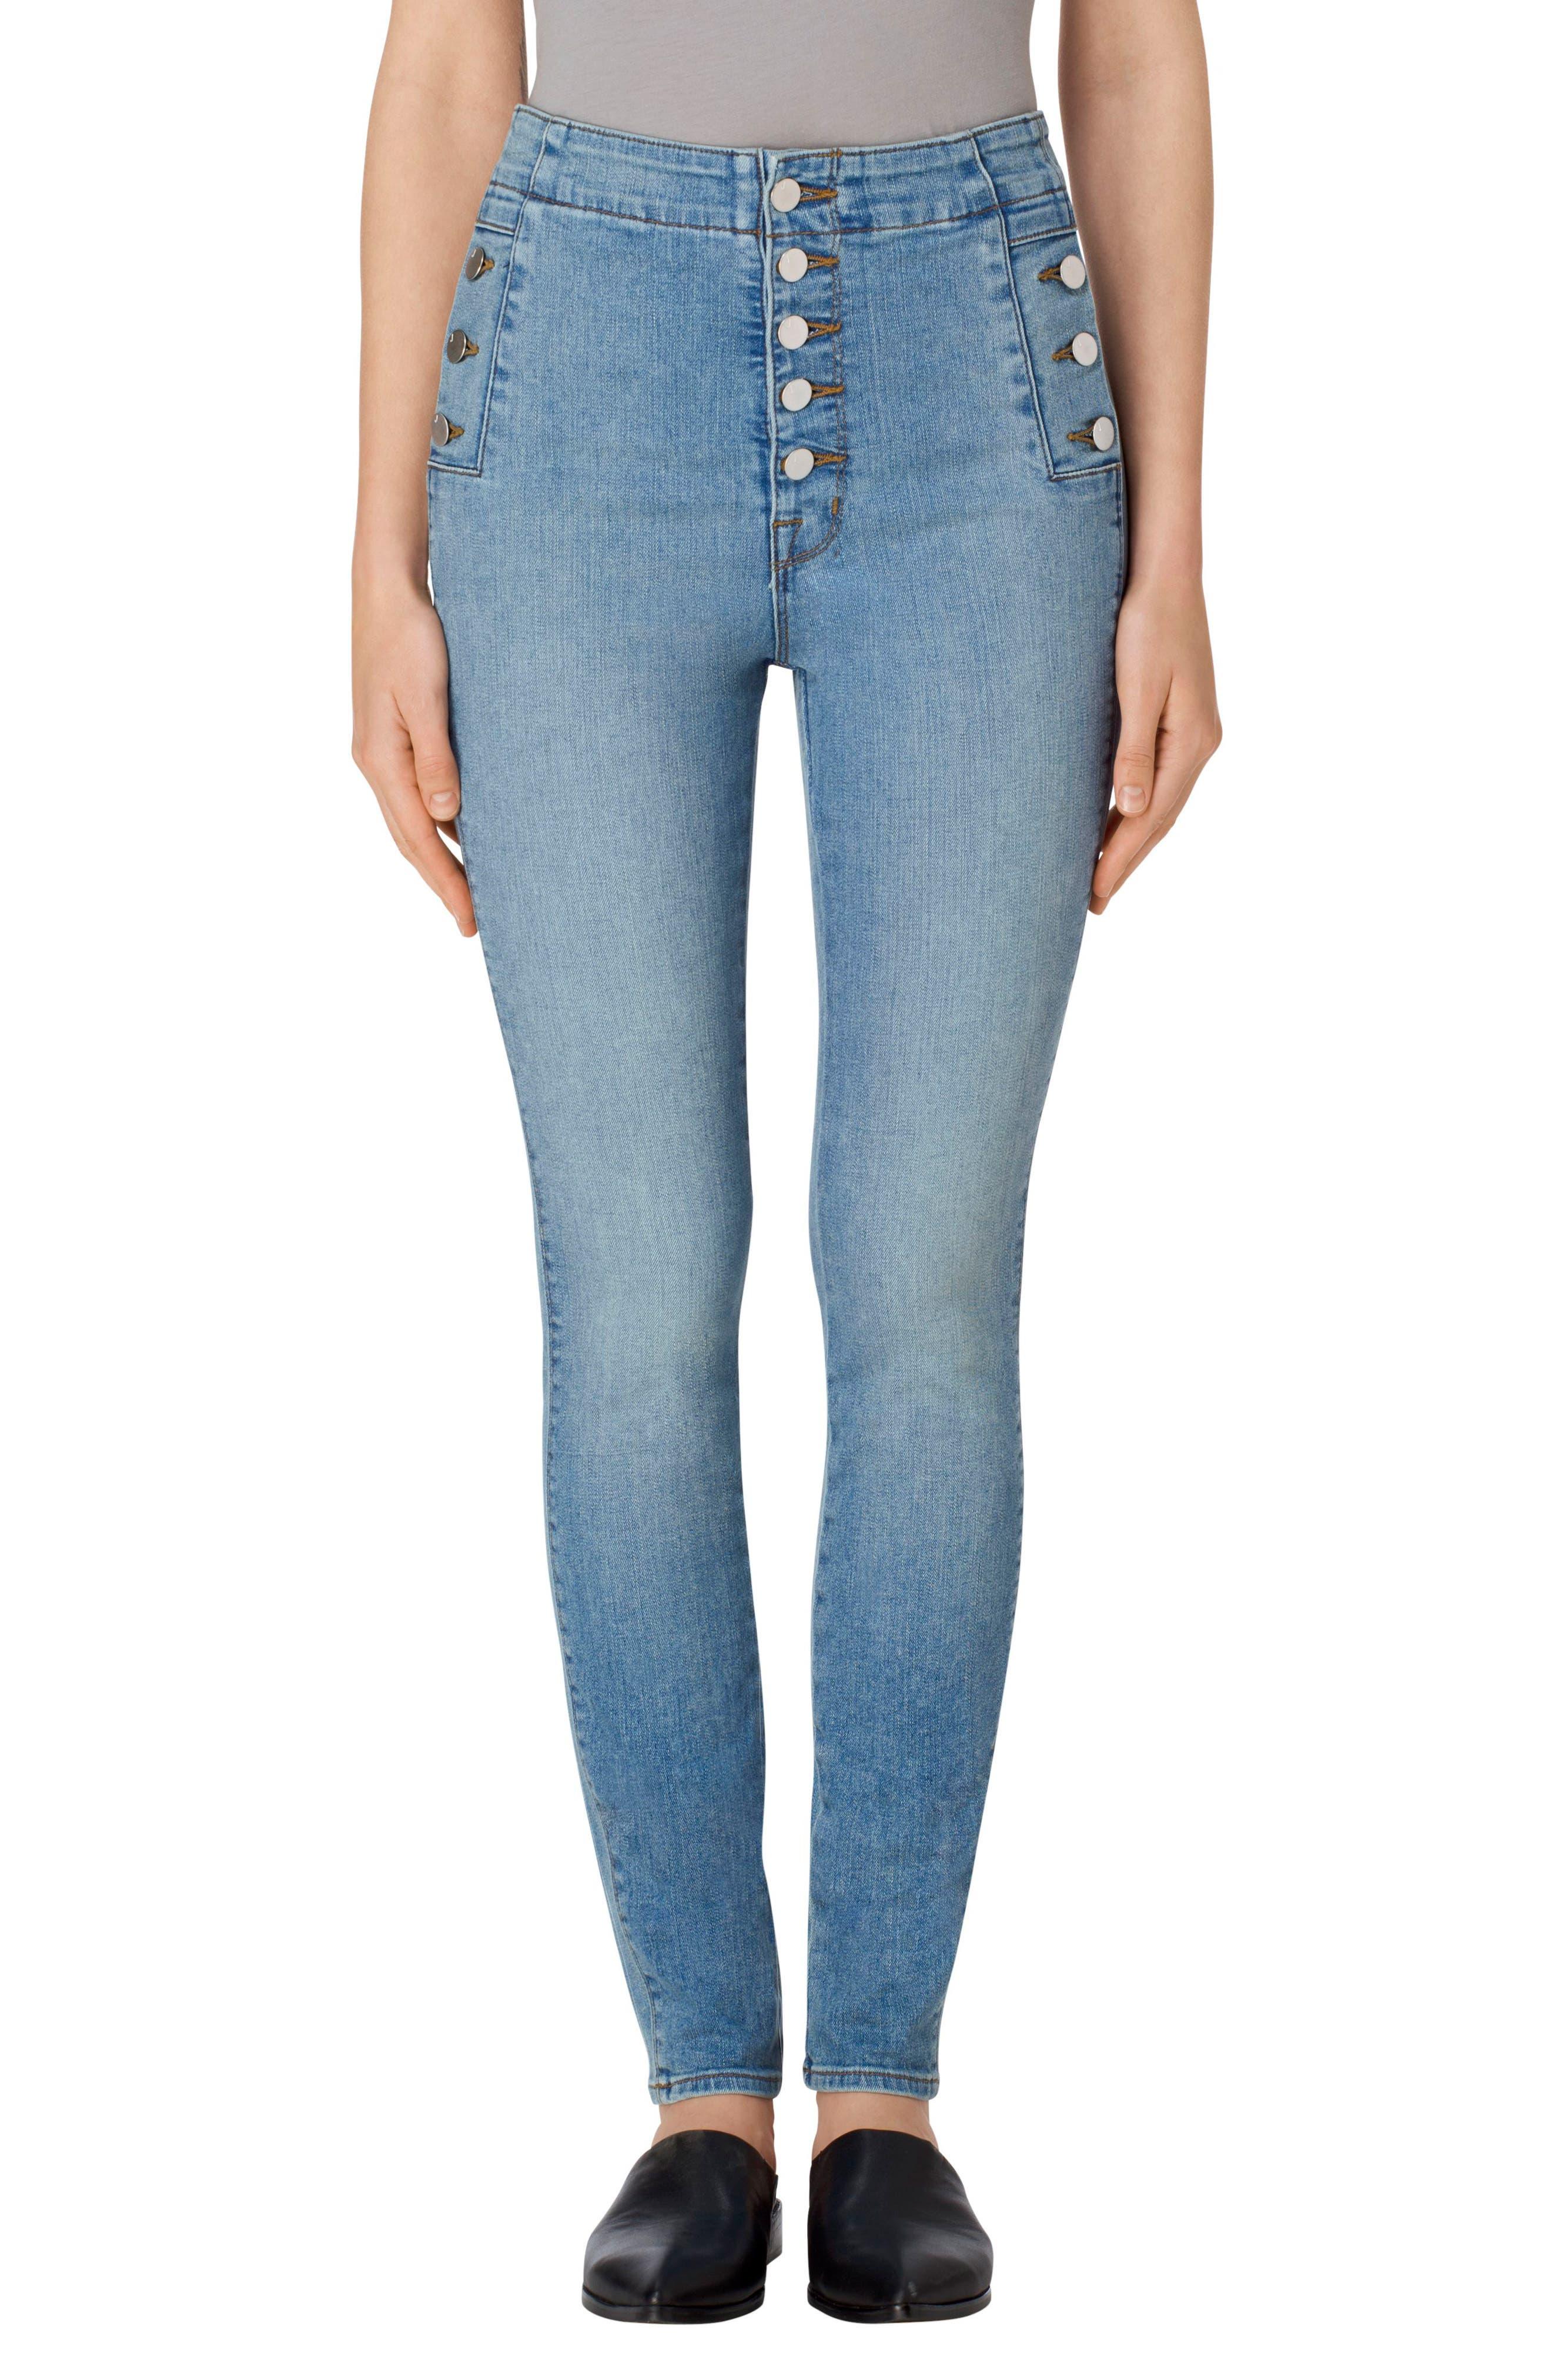 Alternate Image 1 Selected - J Brand Natasha Sky High High Waist Skinny Jeans (Nordstrom Exclusive)